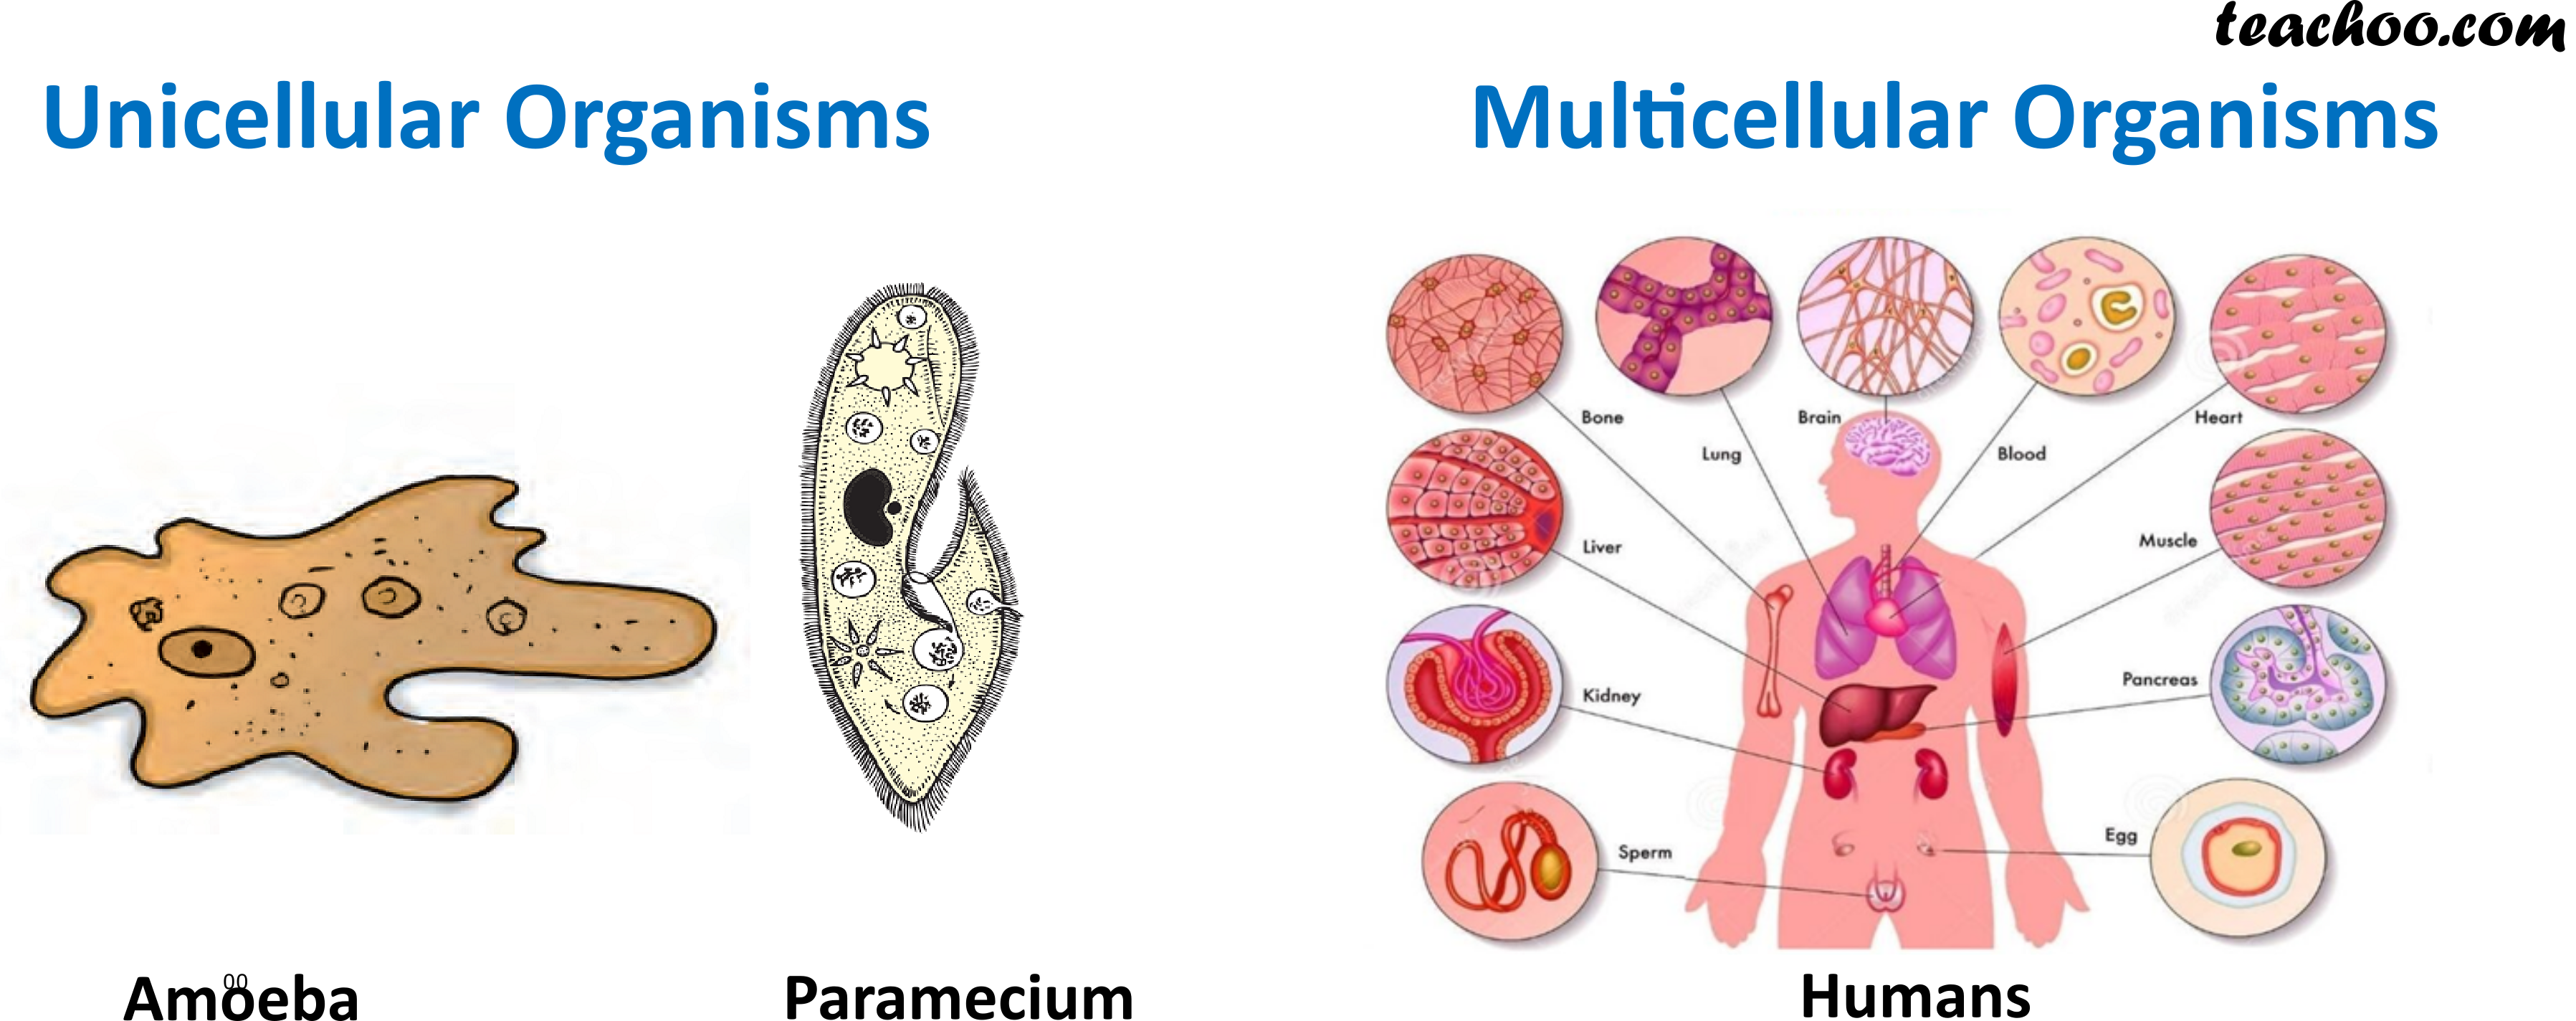 Unicellular Organisms and Multicellular Organisms - Teachoo.png